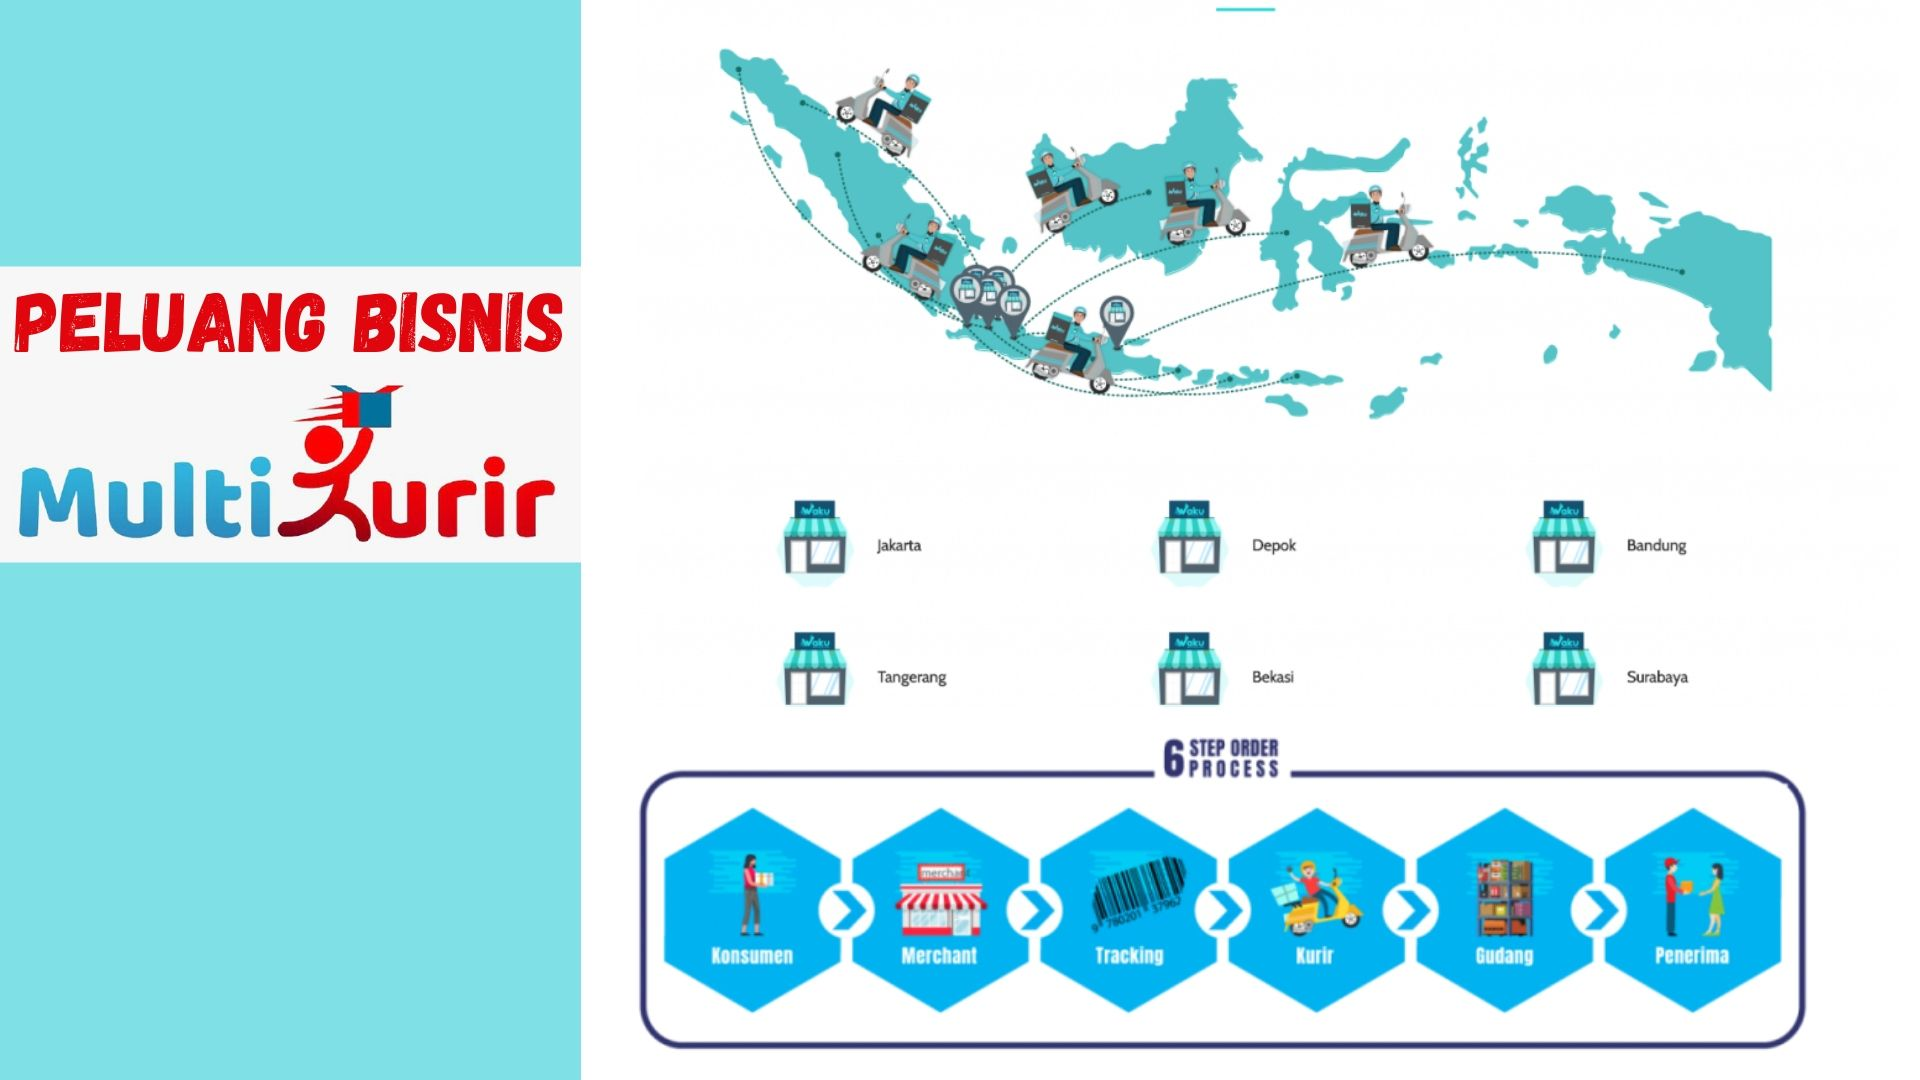 Info Peluang Bisnis Modal Kecil Pandansari Kabupaten Bogor ...